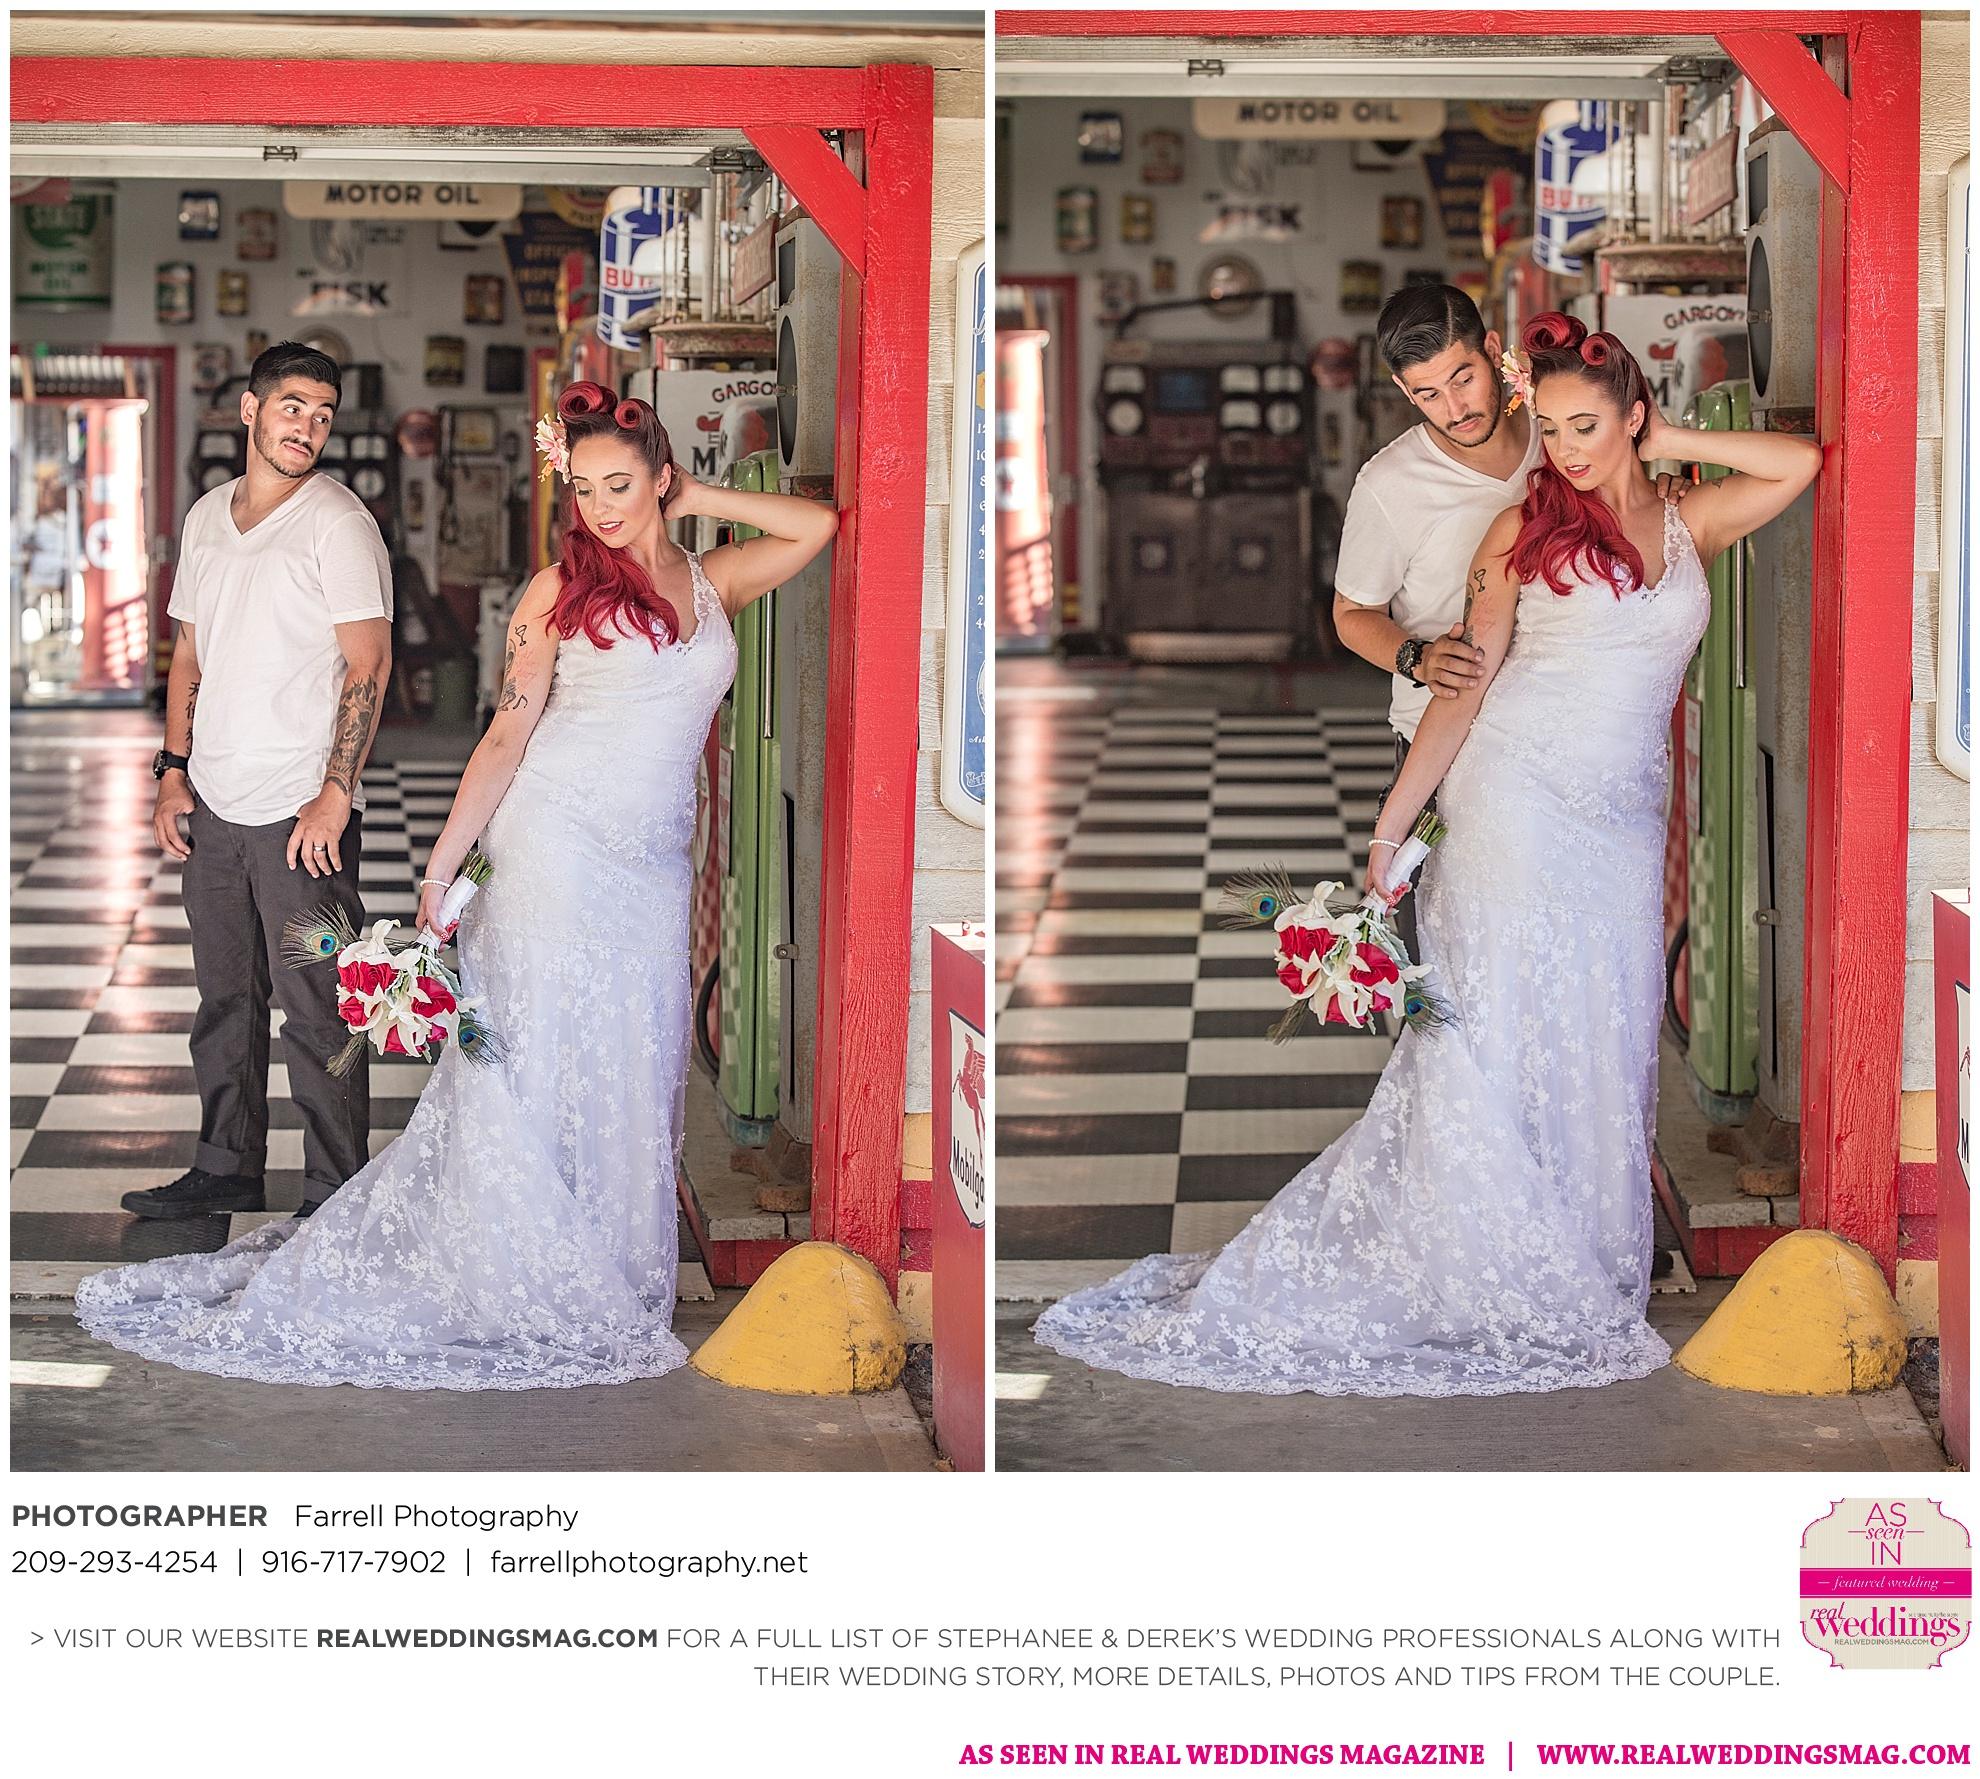 farrell-photography-stephanee-derek-real-weddings-sacramento-wedding-photographer-_0050